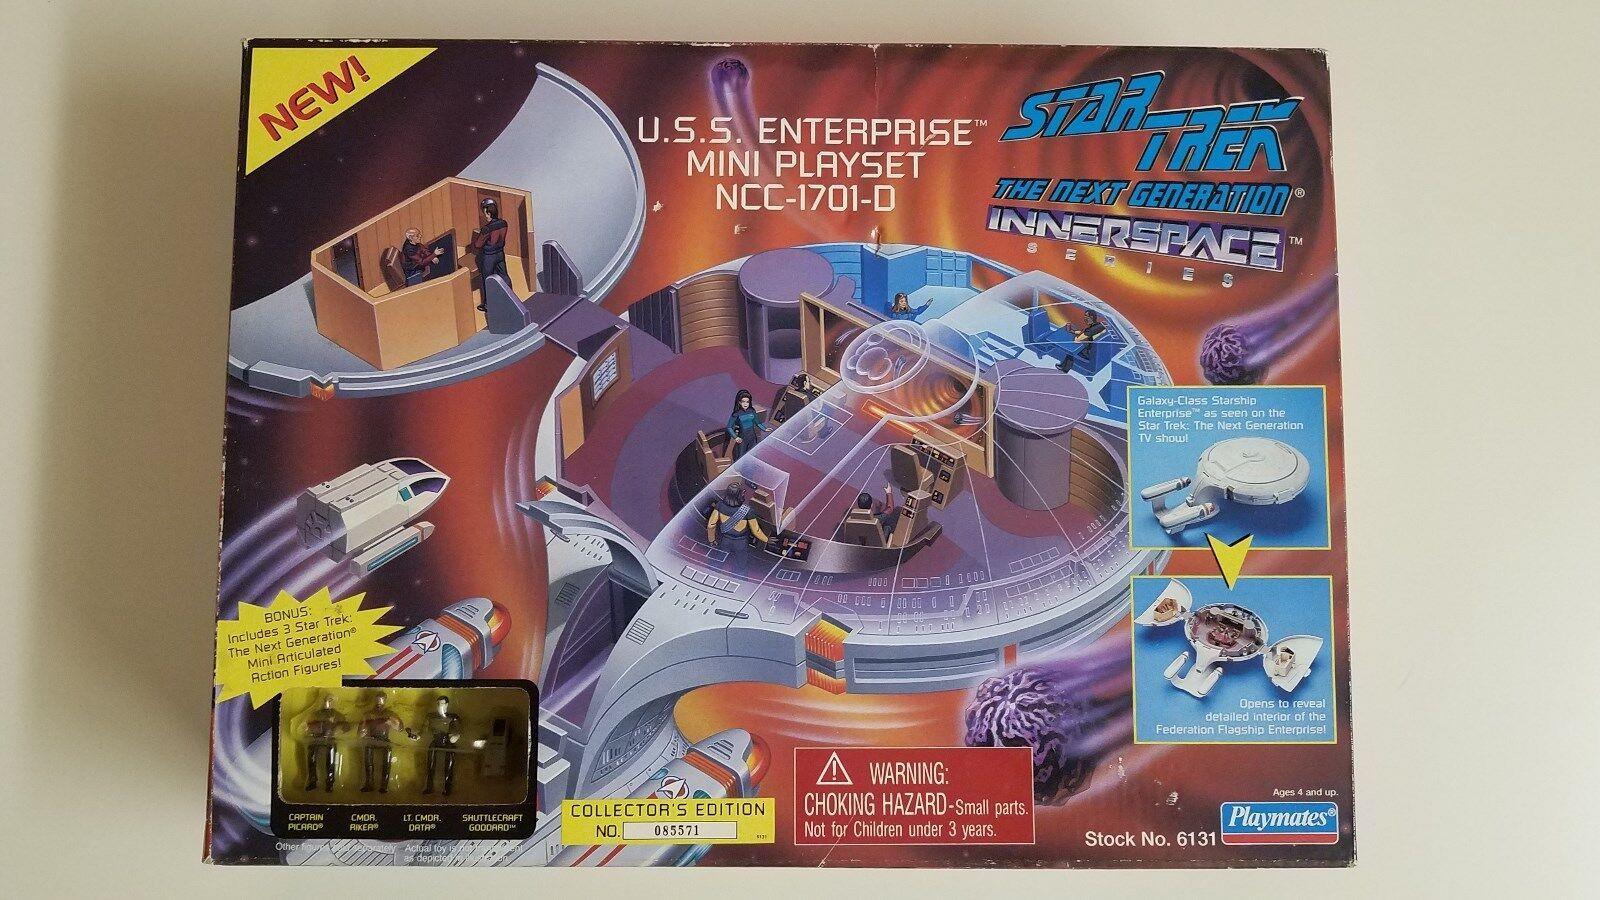 U.S.S. Enterprise Mini Playset Collector's Edition Star Trek Next Generation Generation Generation dd3620